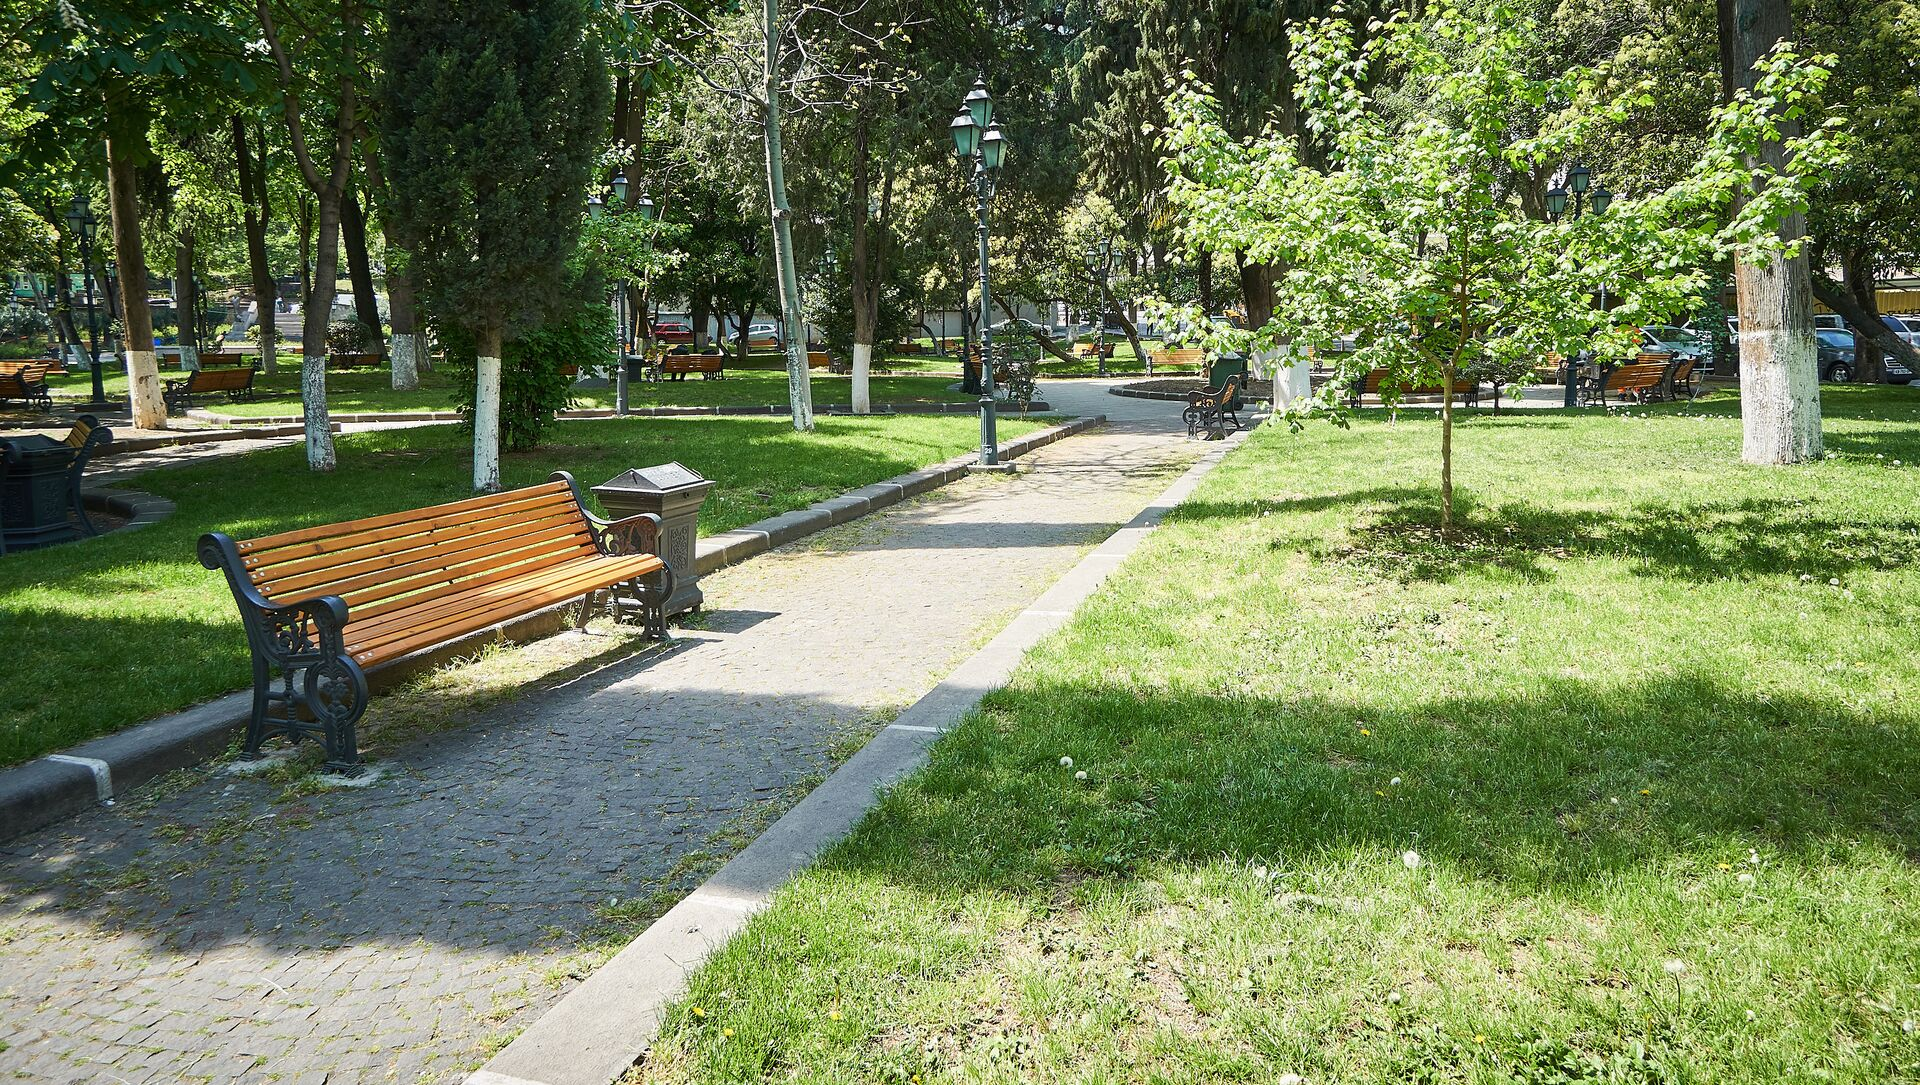 Парк Александровский сад на улице Атонели у резиденции президента Грузии - Sputnik Грузия, 1920, 10.02.2021